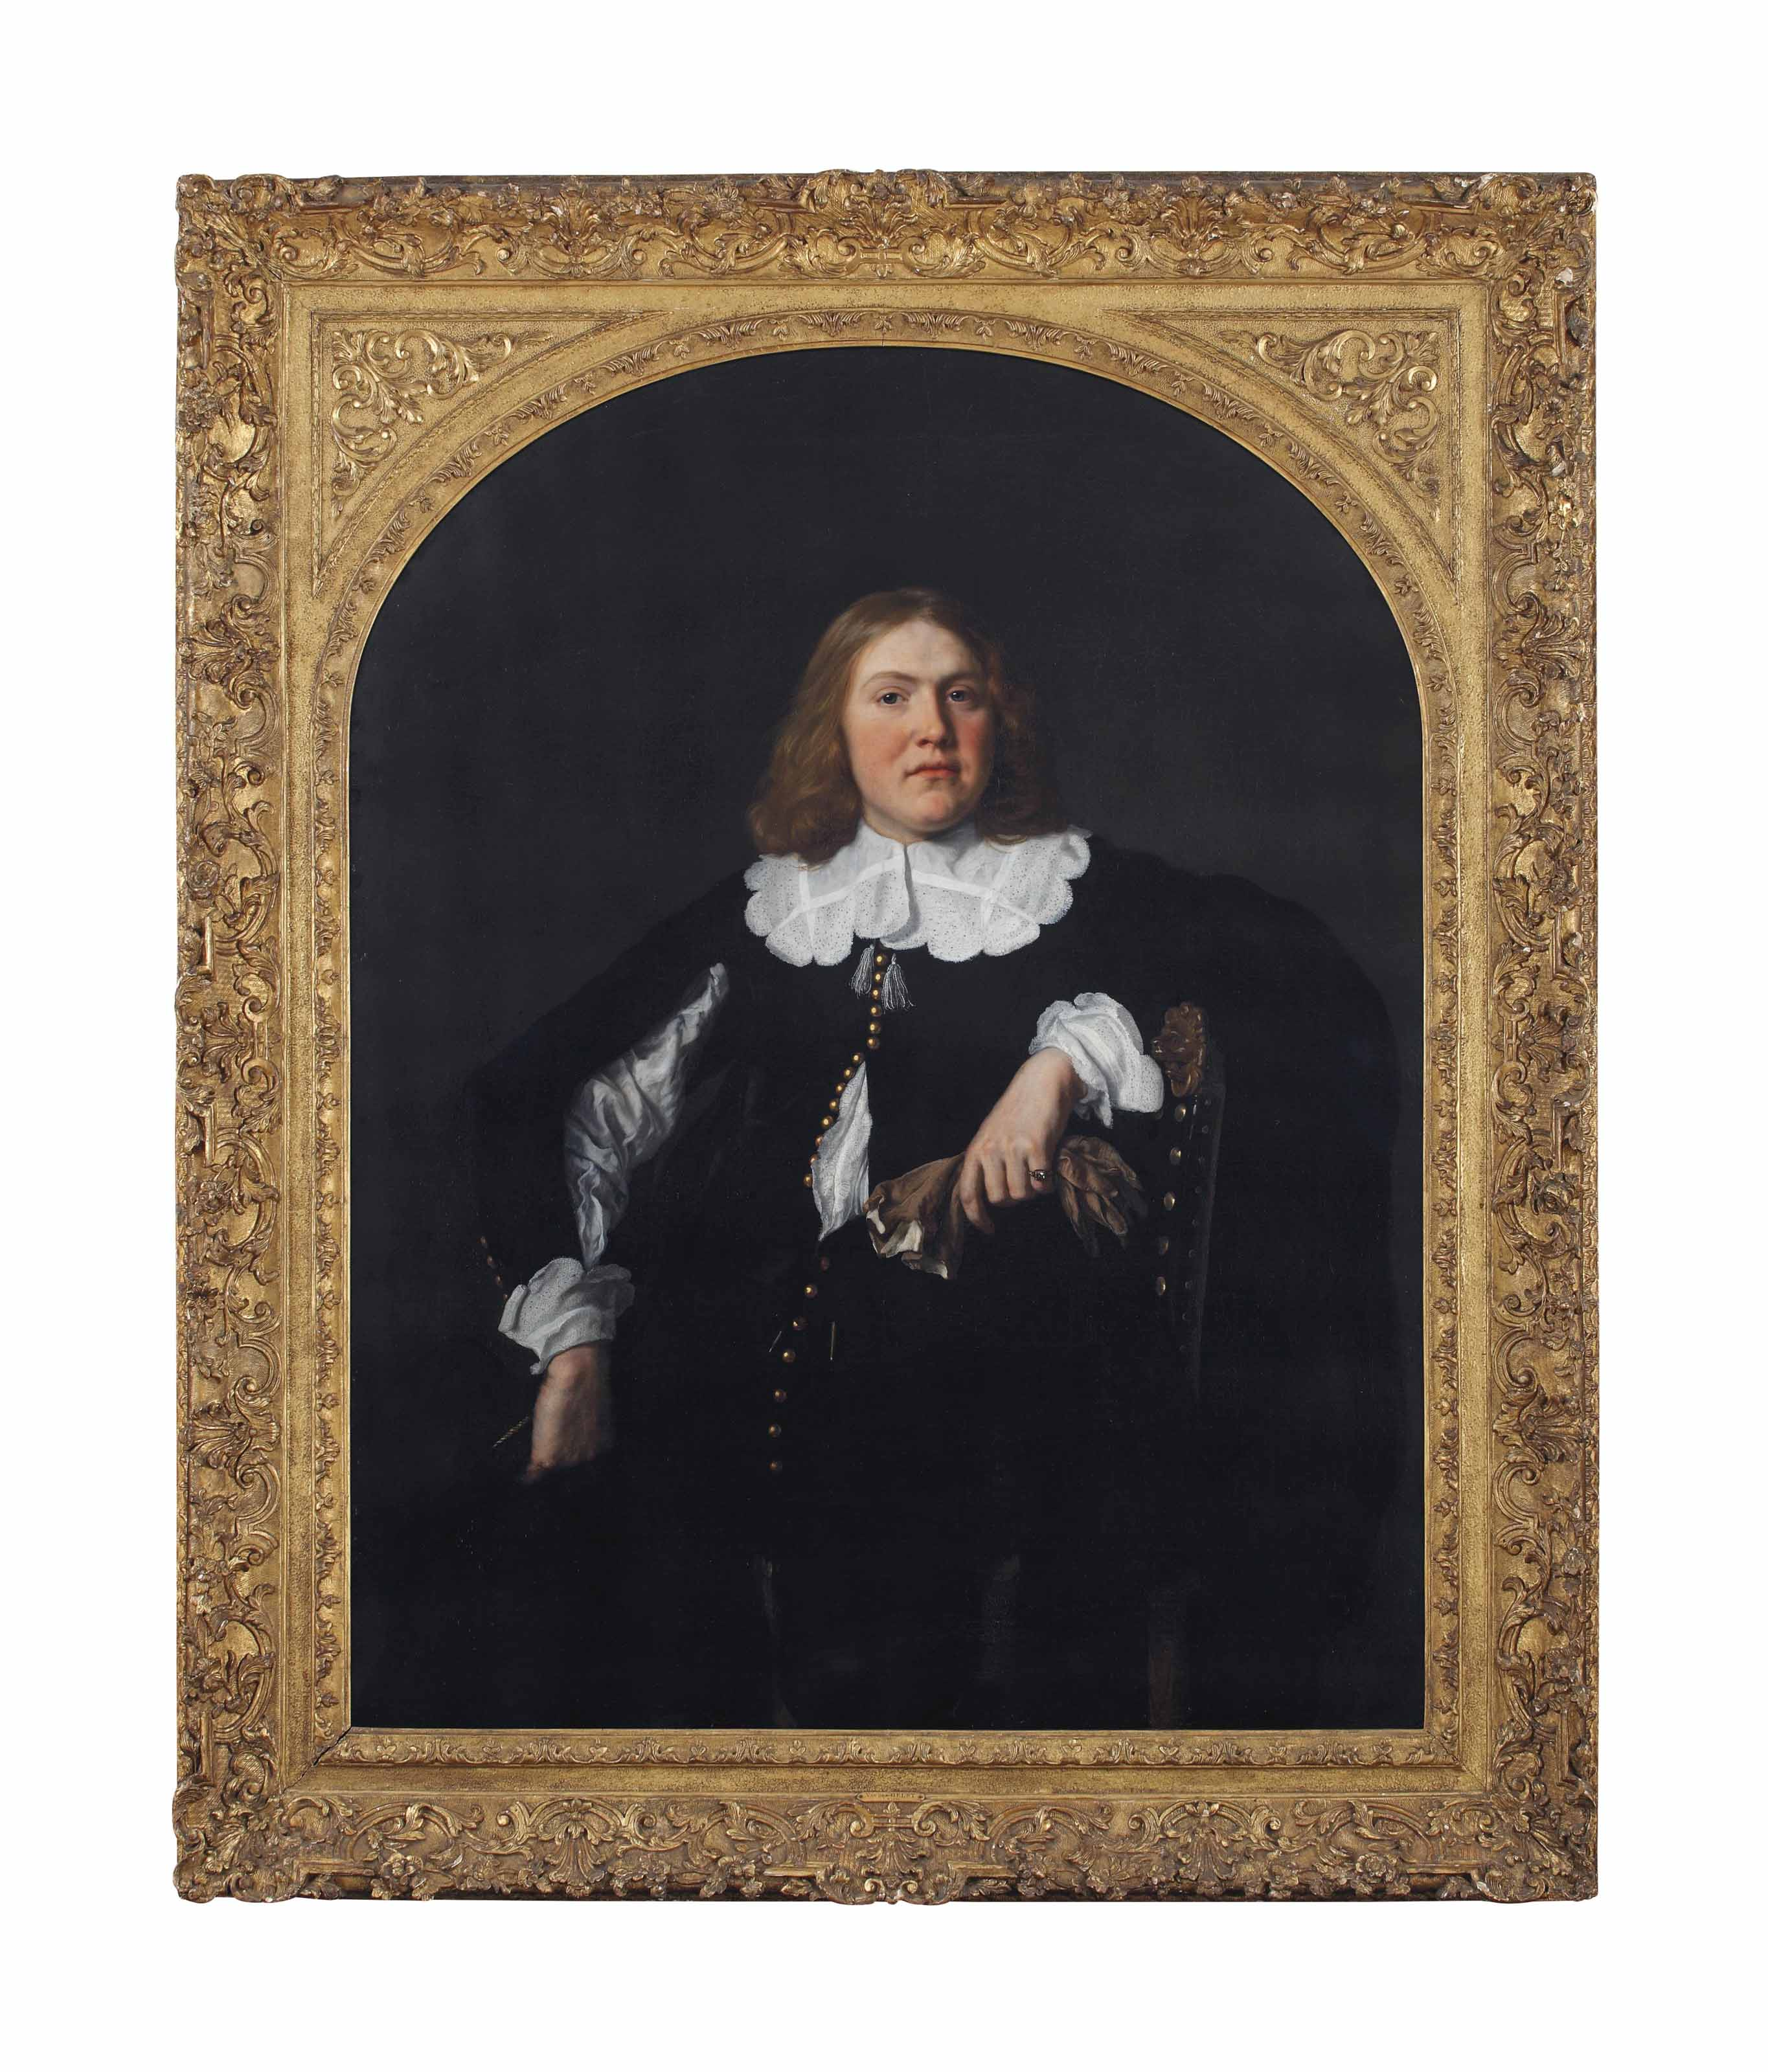 Bartholomeus van der Helst (Haarlem c. 1613-1670 Amsterdam)